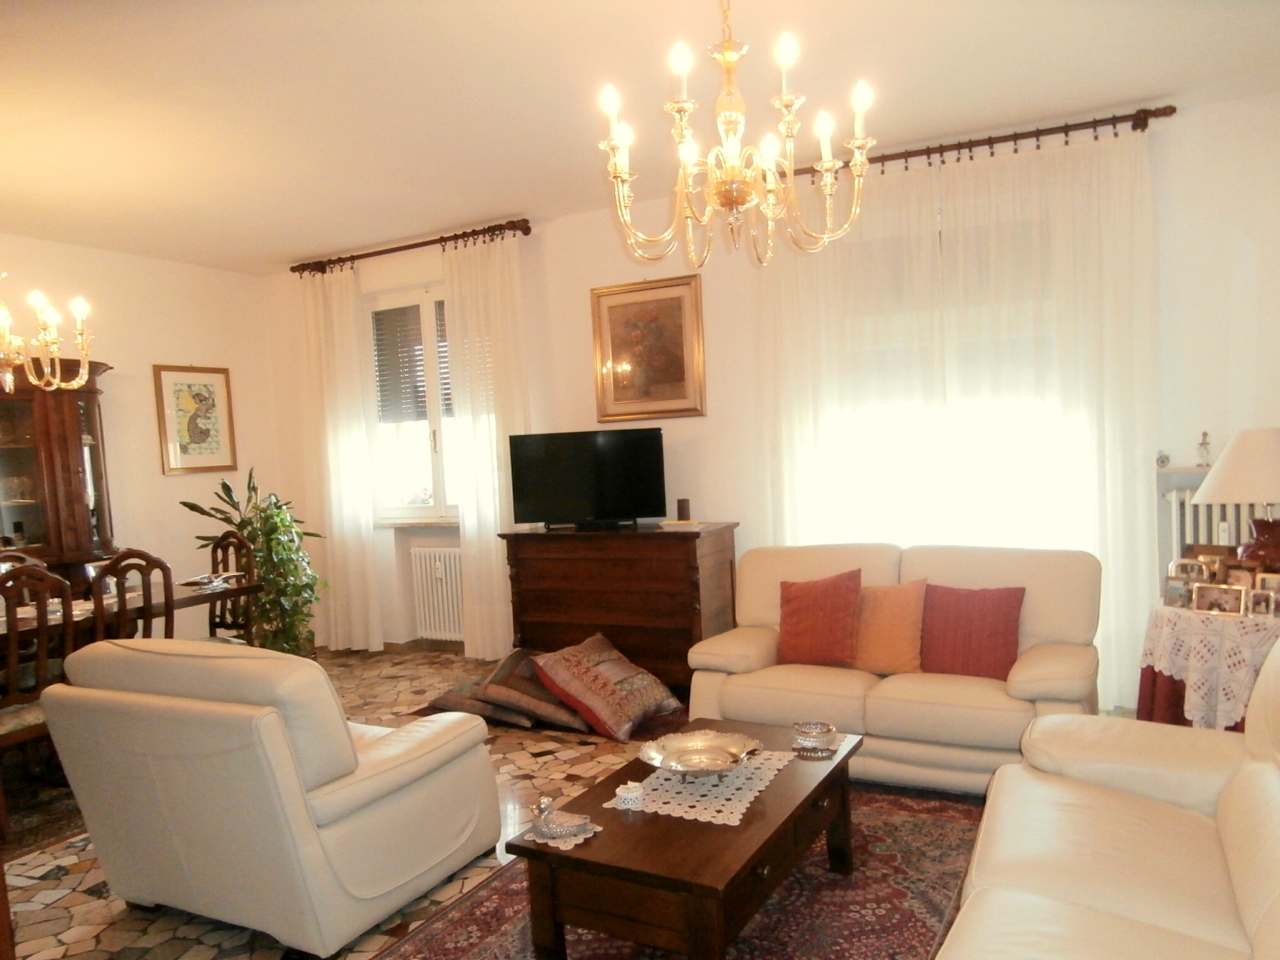 Appartamento, via ravenna, Vendita - Ferrara